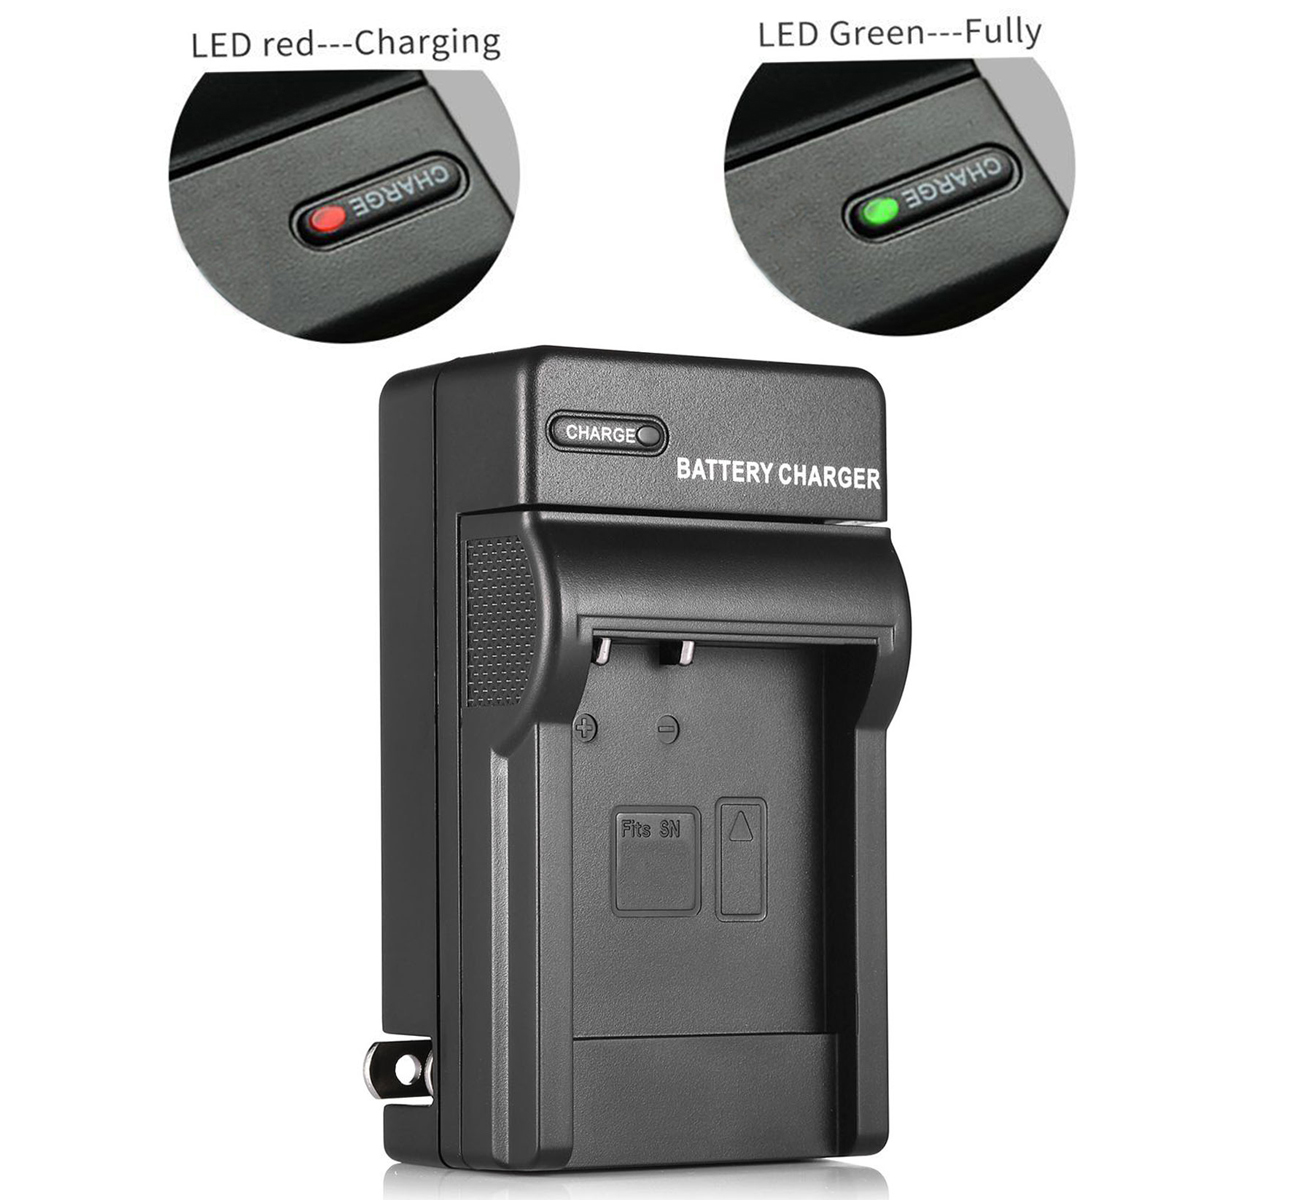 DSTE MH-67P Battery USB Dual Quick Charger Compatible for Nikon EN-EL23 EN EL23 Battery,Nikon Coolpix P600,P610,P610s,B700,S810c,P900,P900S Camera